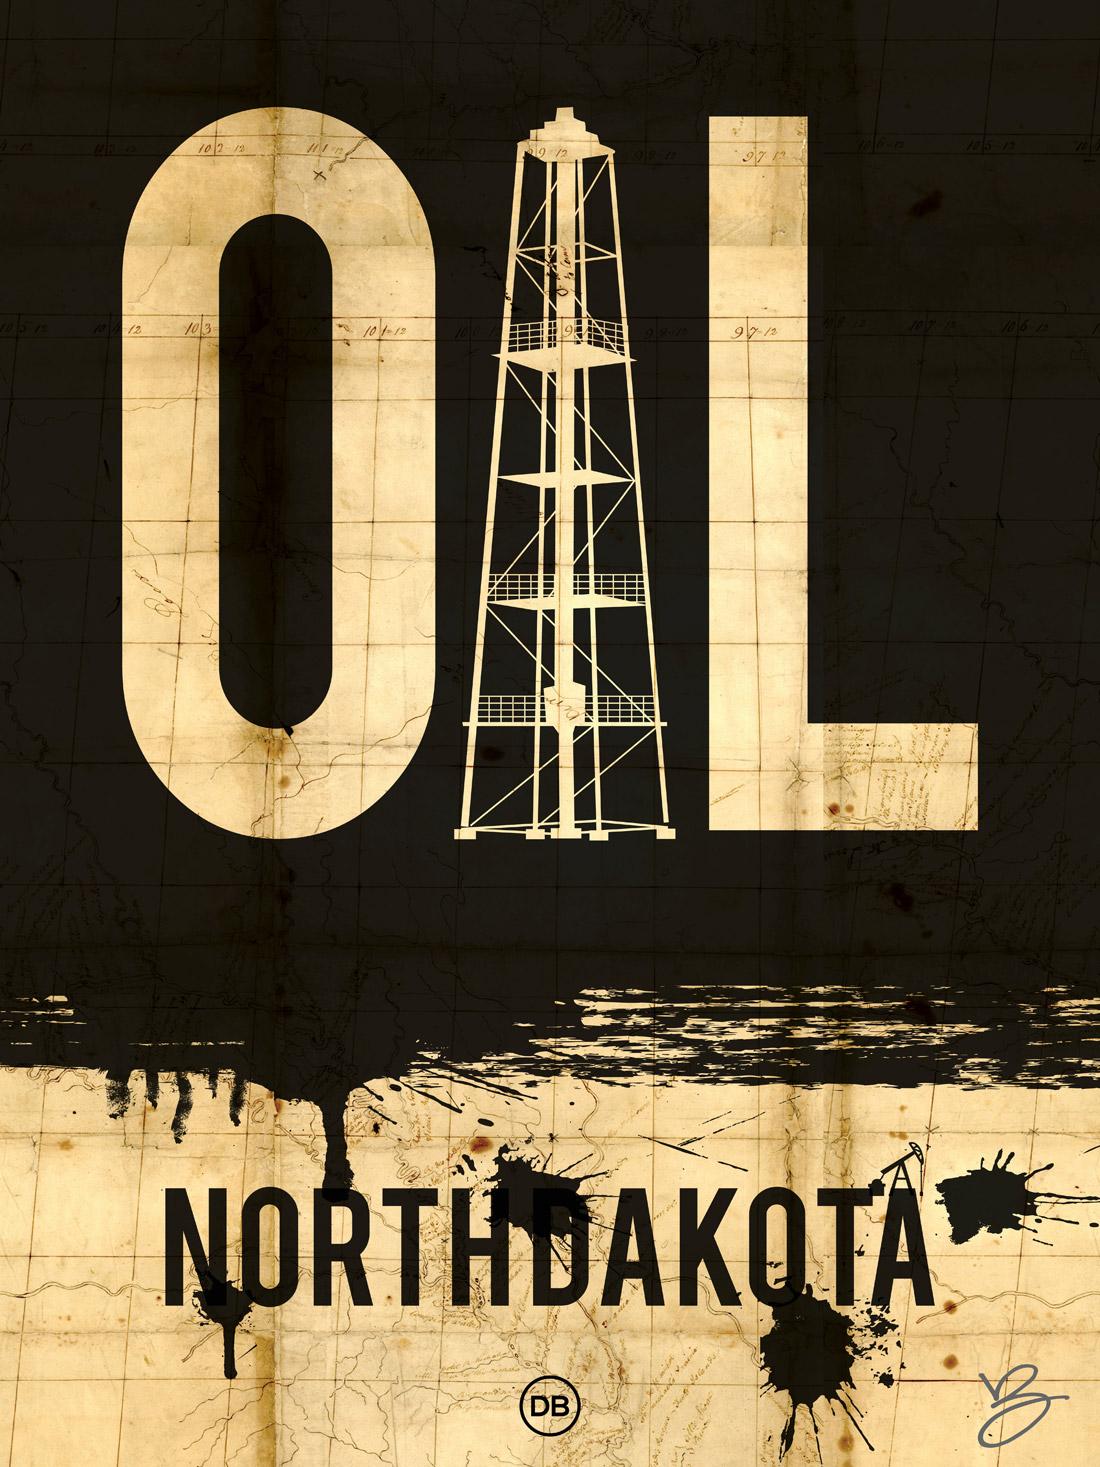 David Bernie OIL North Dakota Indian Country 52 Week 44